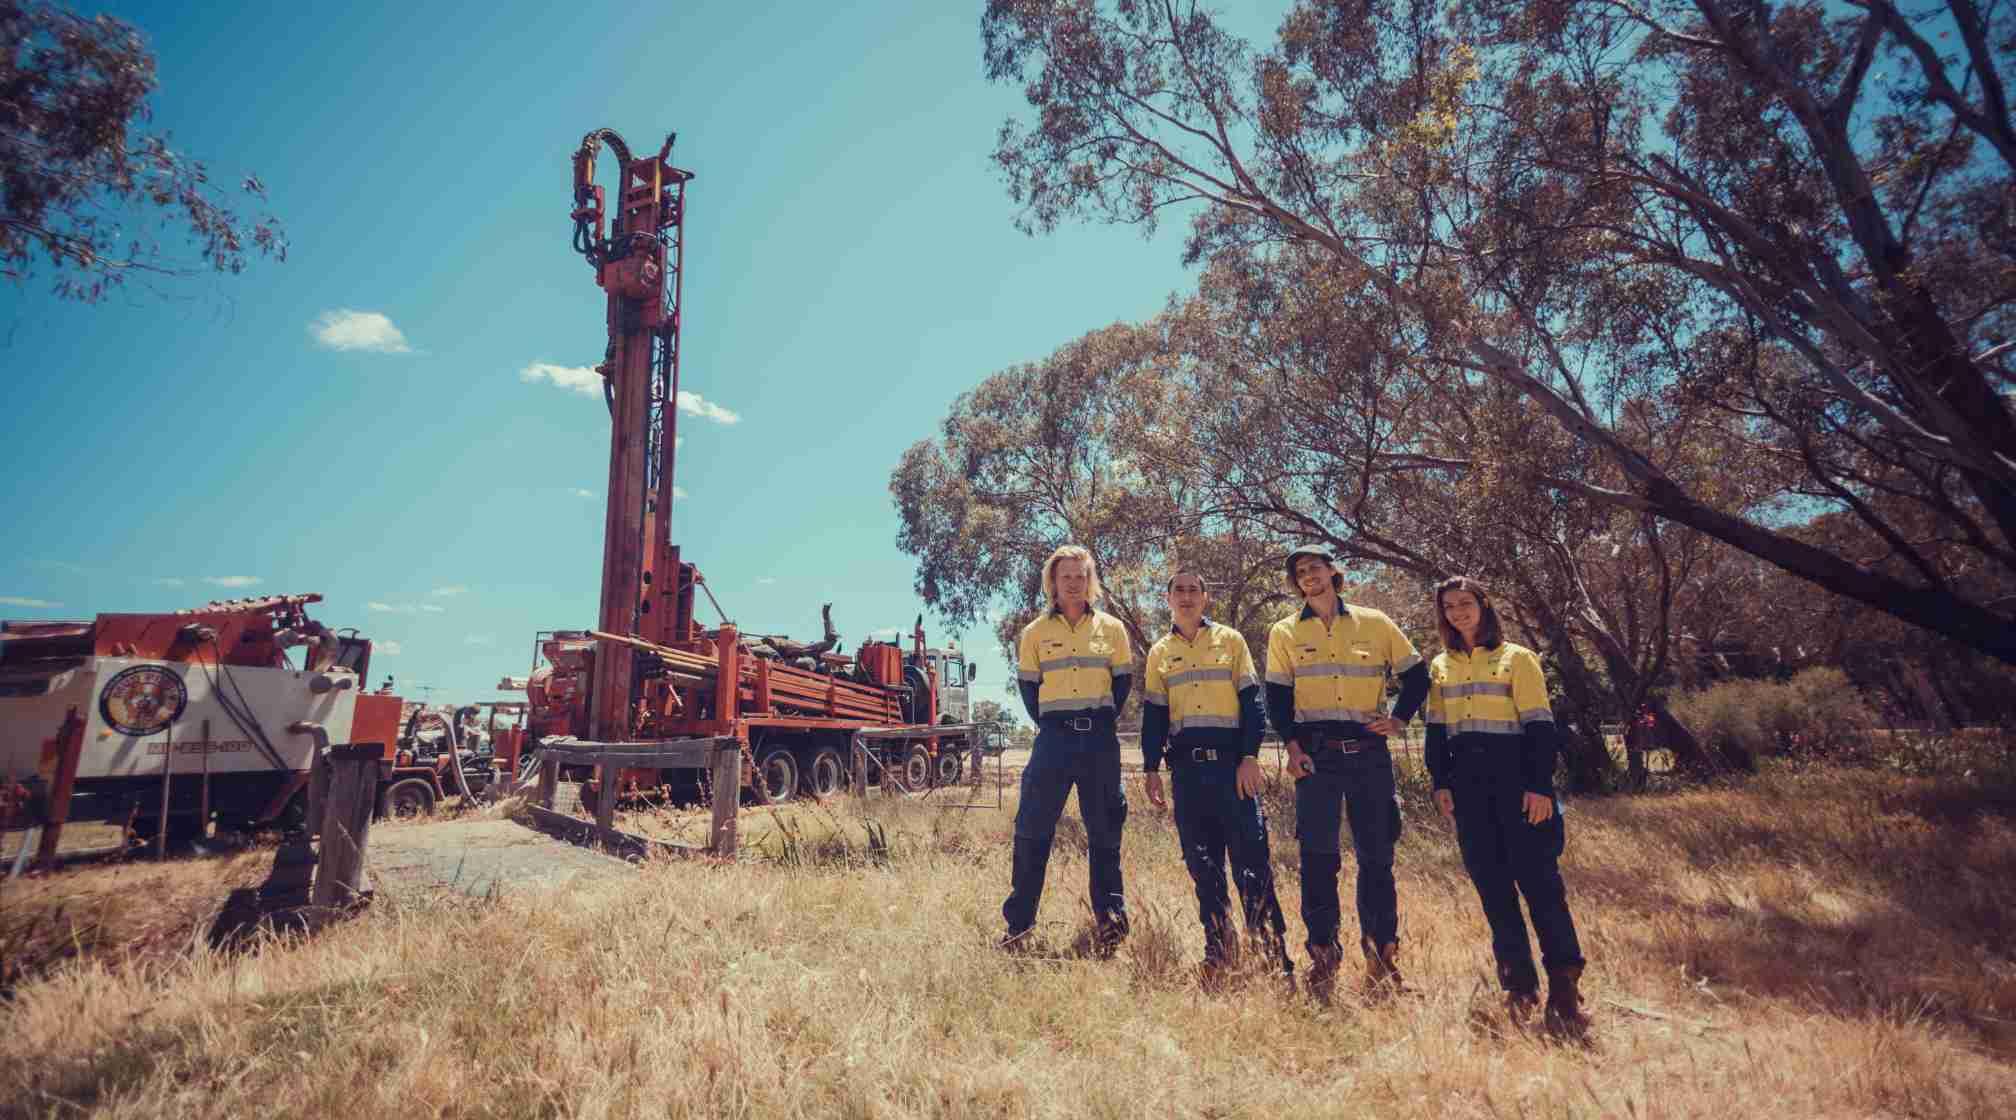 Western Australian superficial aquifer bore field installation.